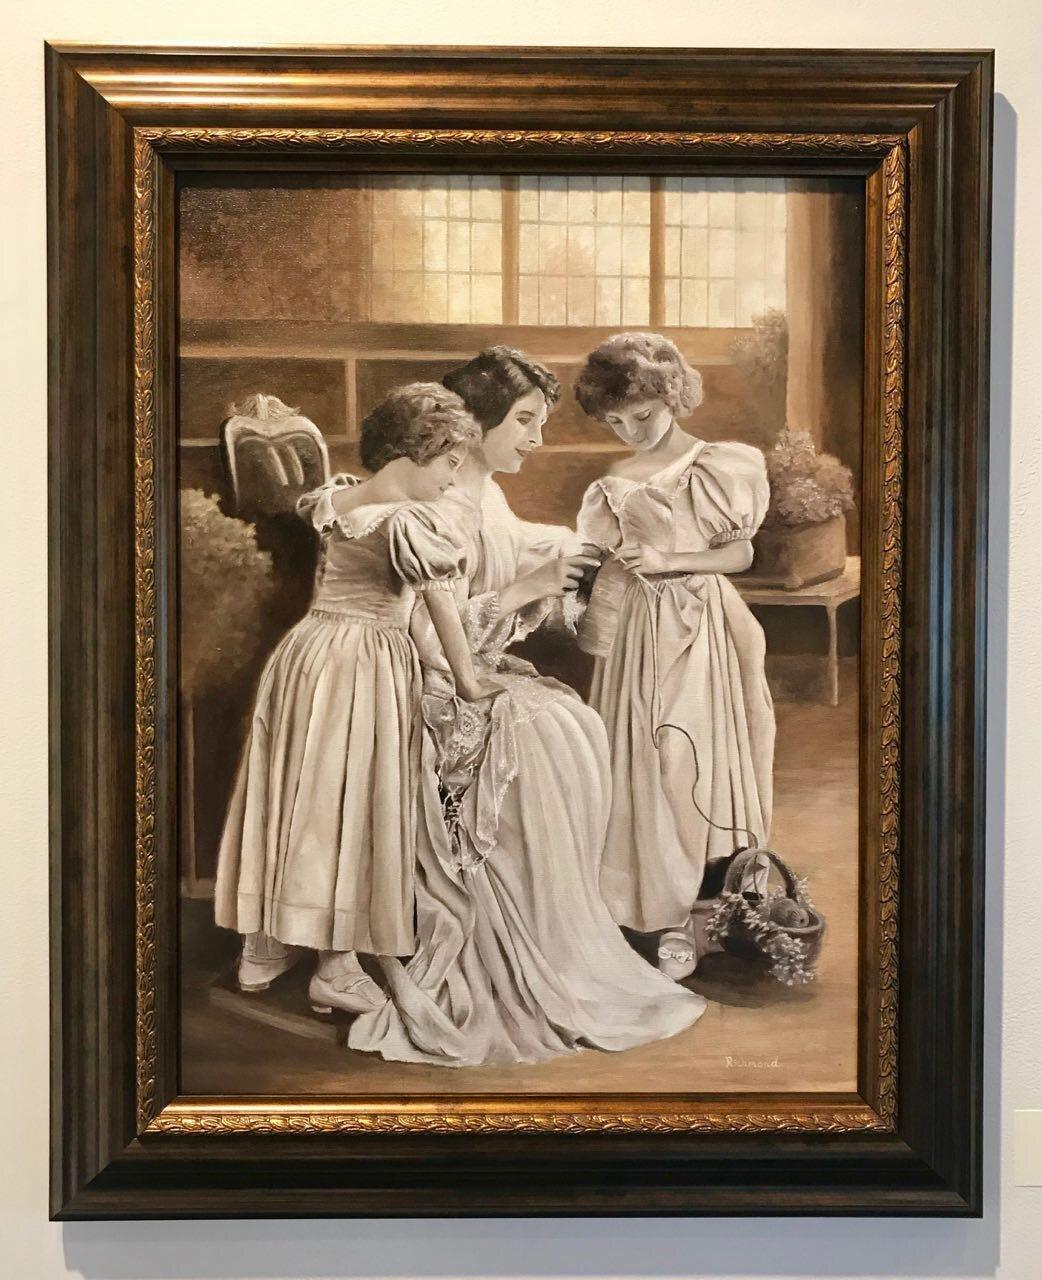 A Mother's Touch by Tyler R. Lambert